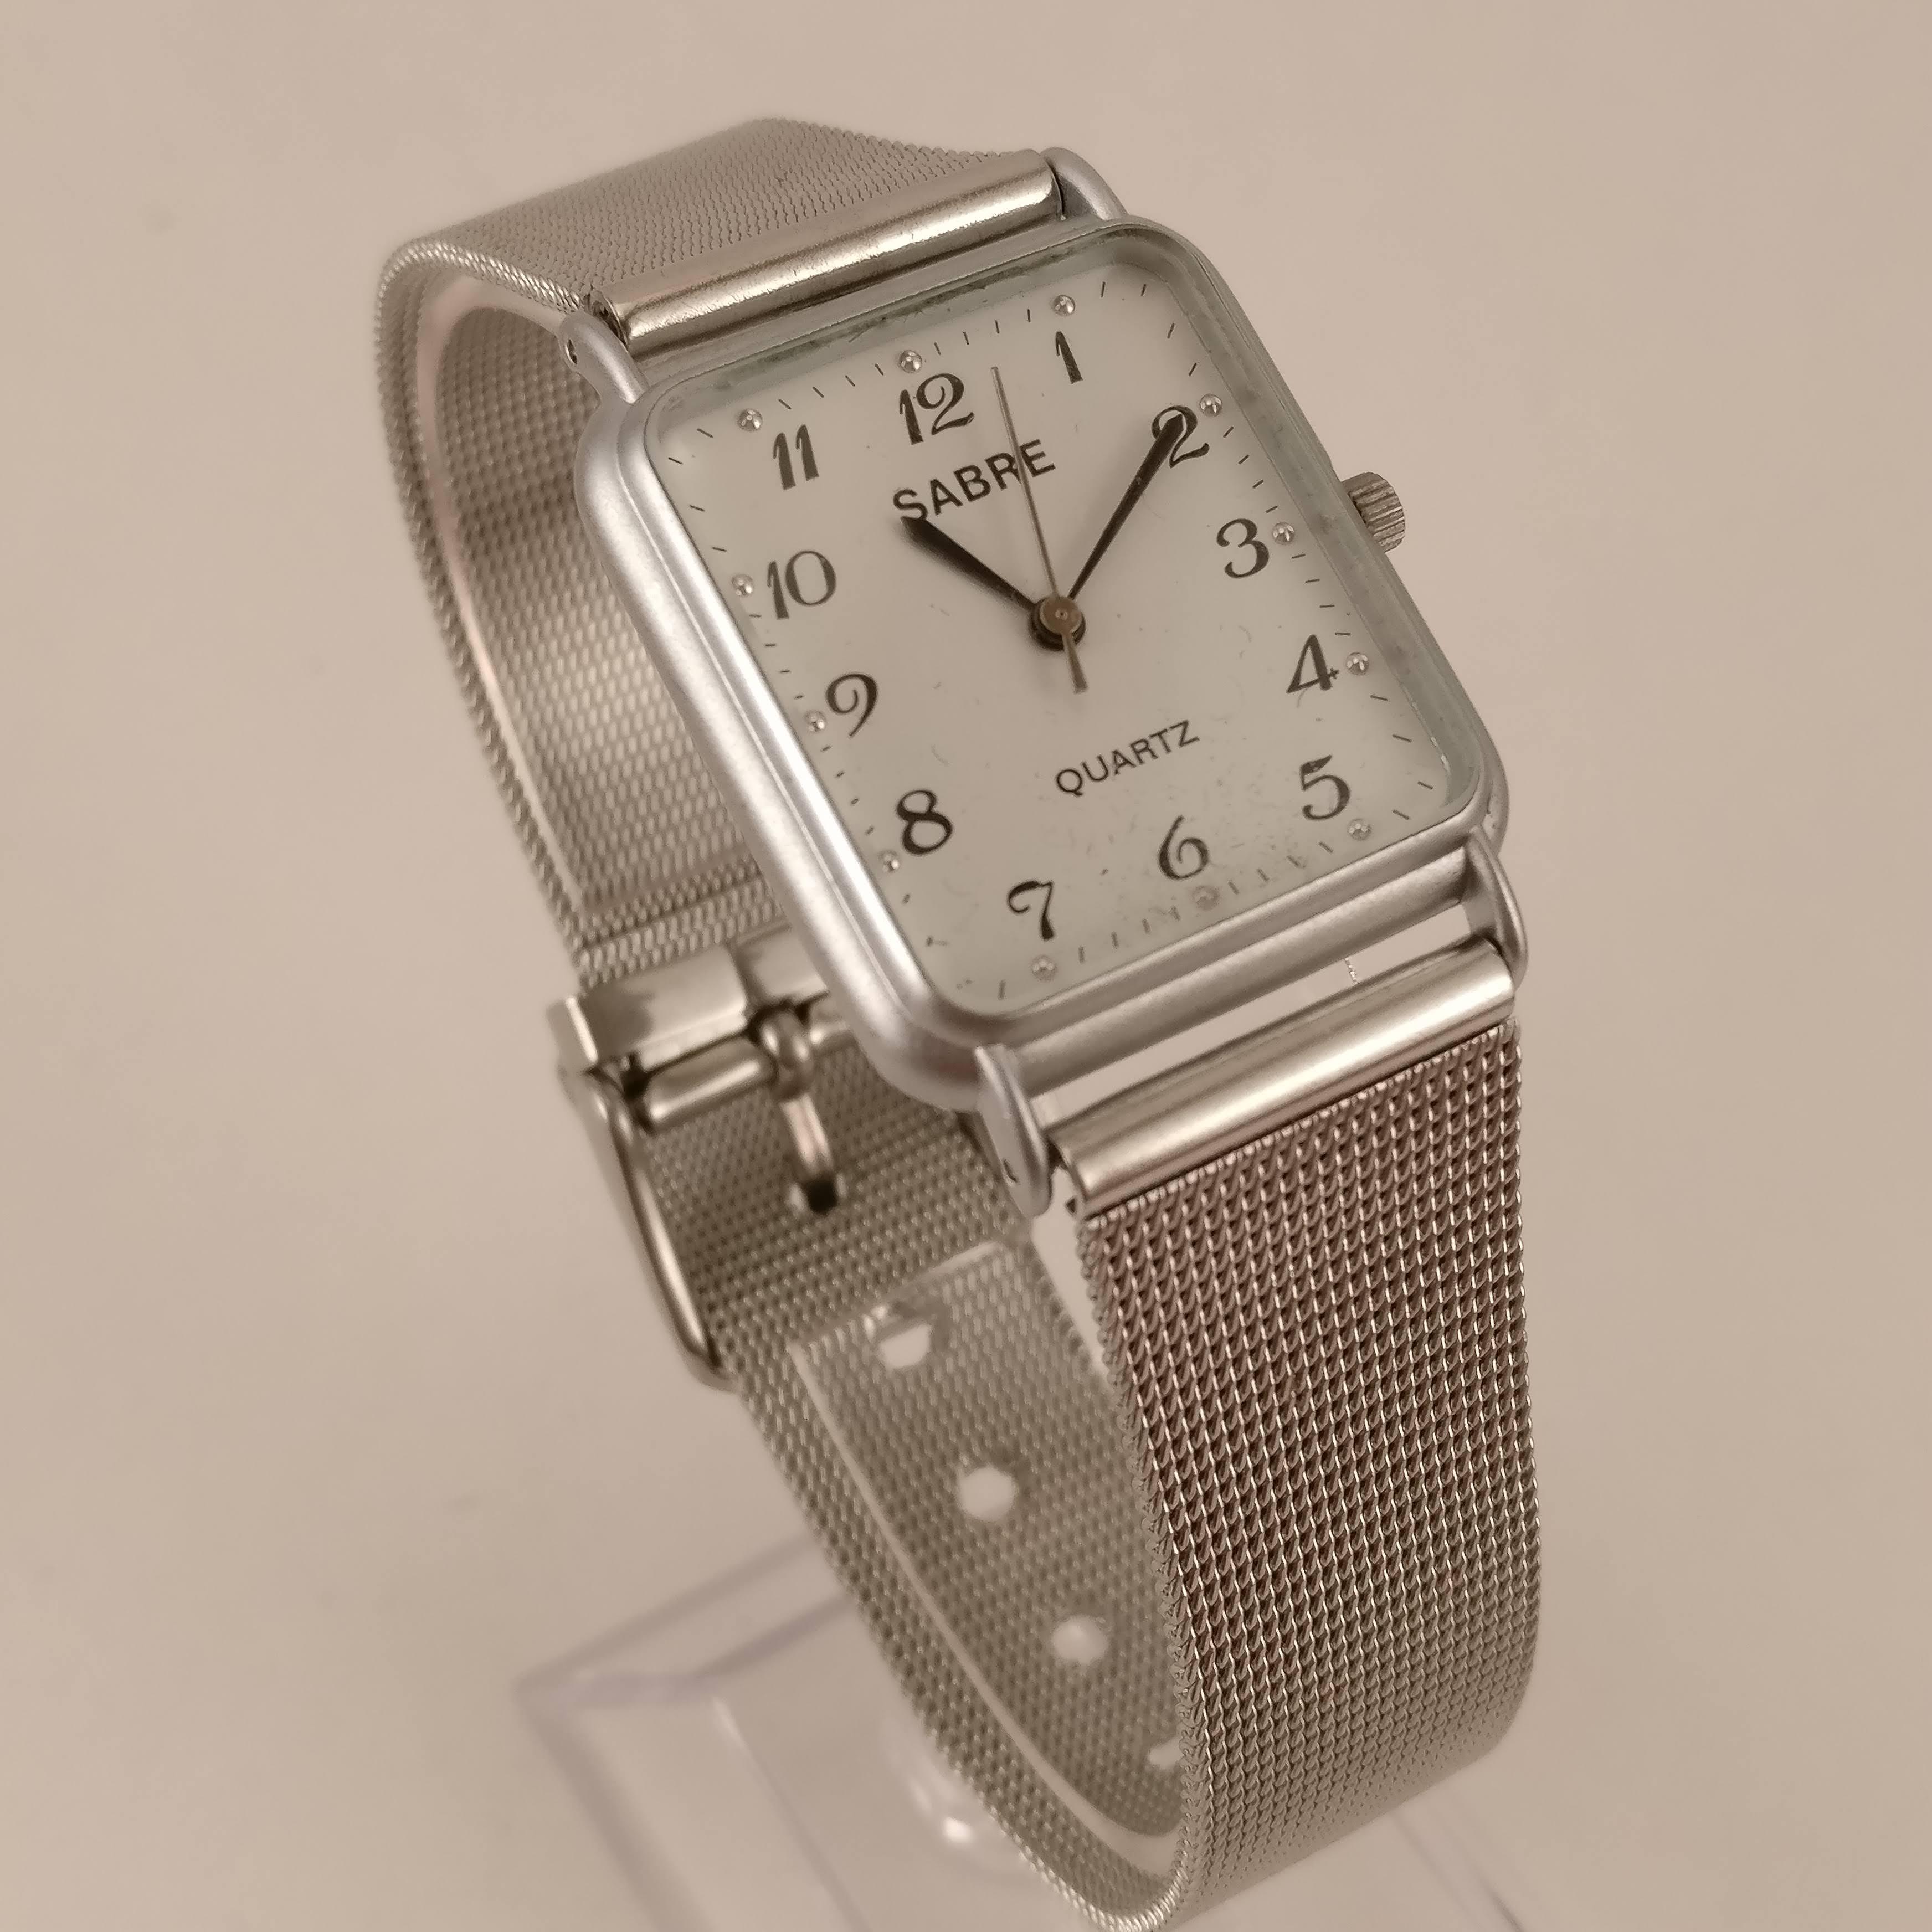 Uitgelezene Sabre Dames Horloge MY-83